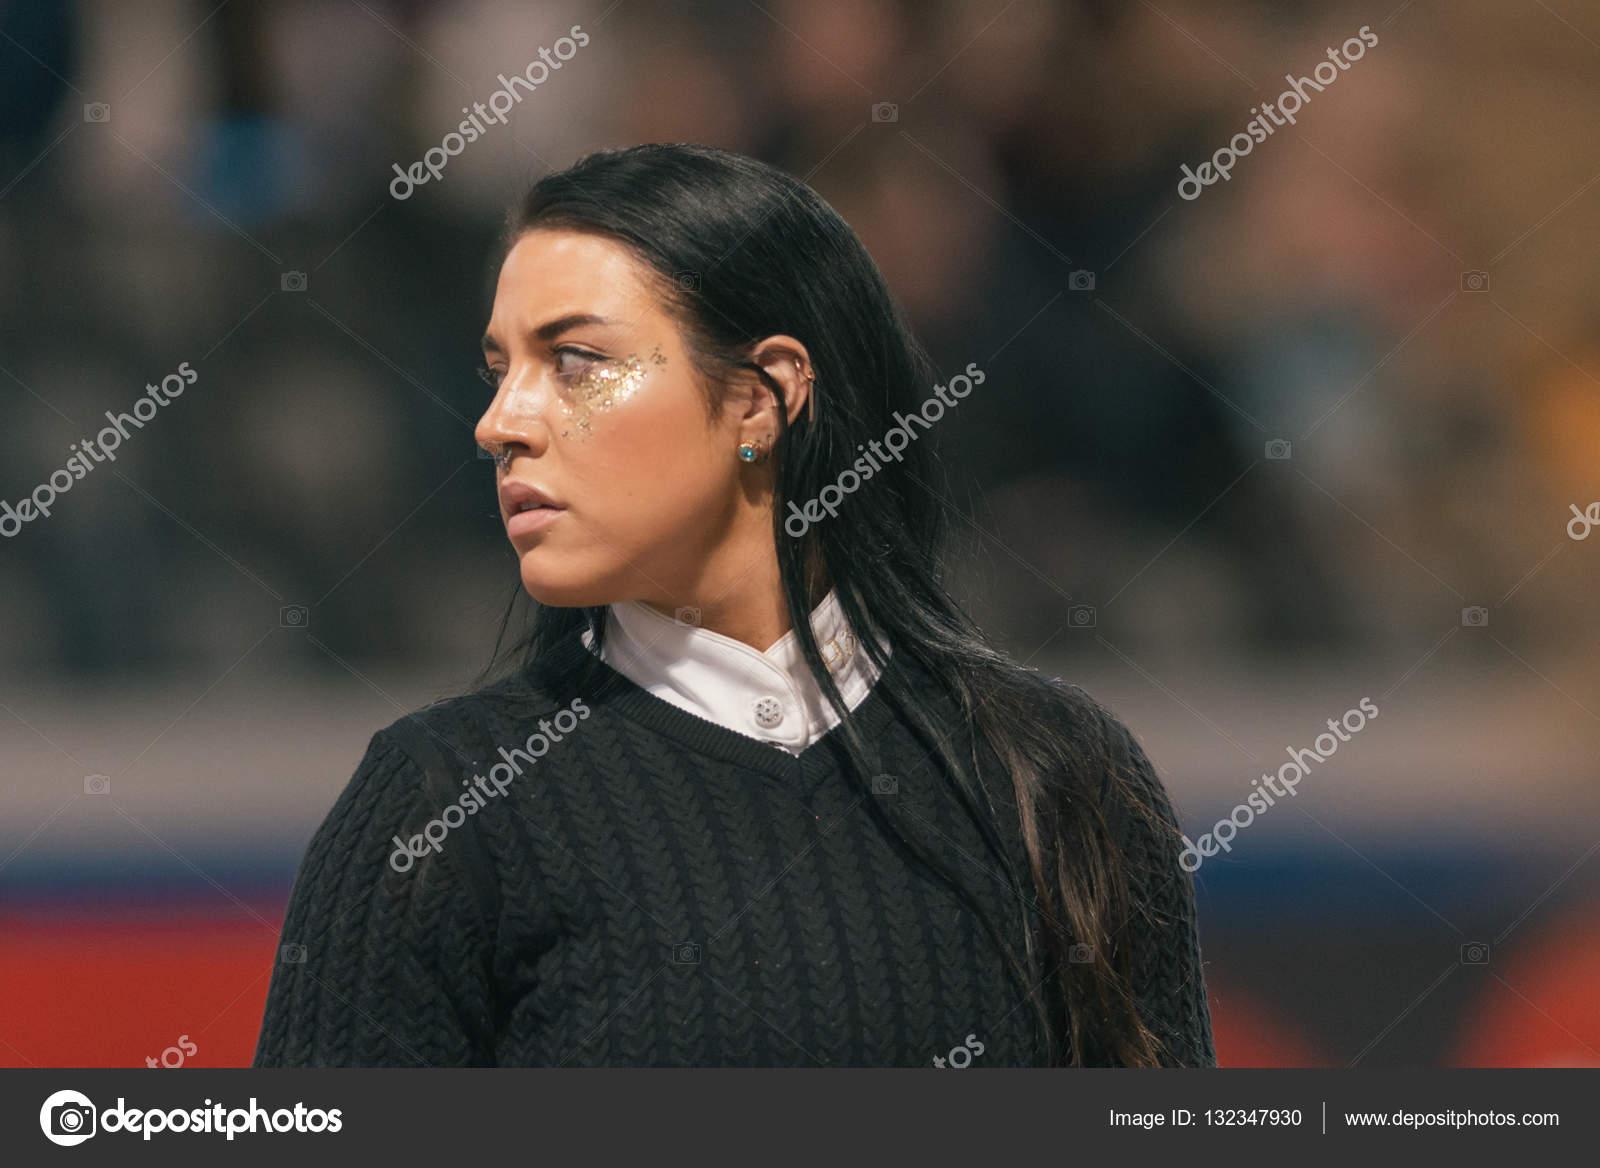 Maxida Marak At The Celebrity Jumping In The Sweden Internationa Stock Photo